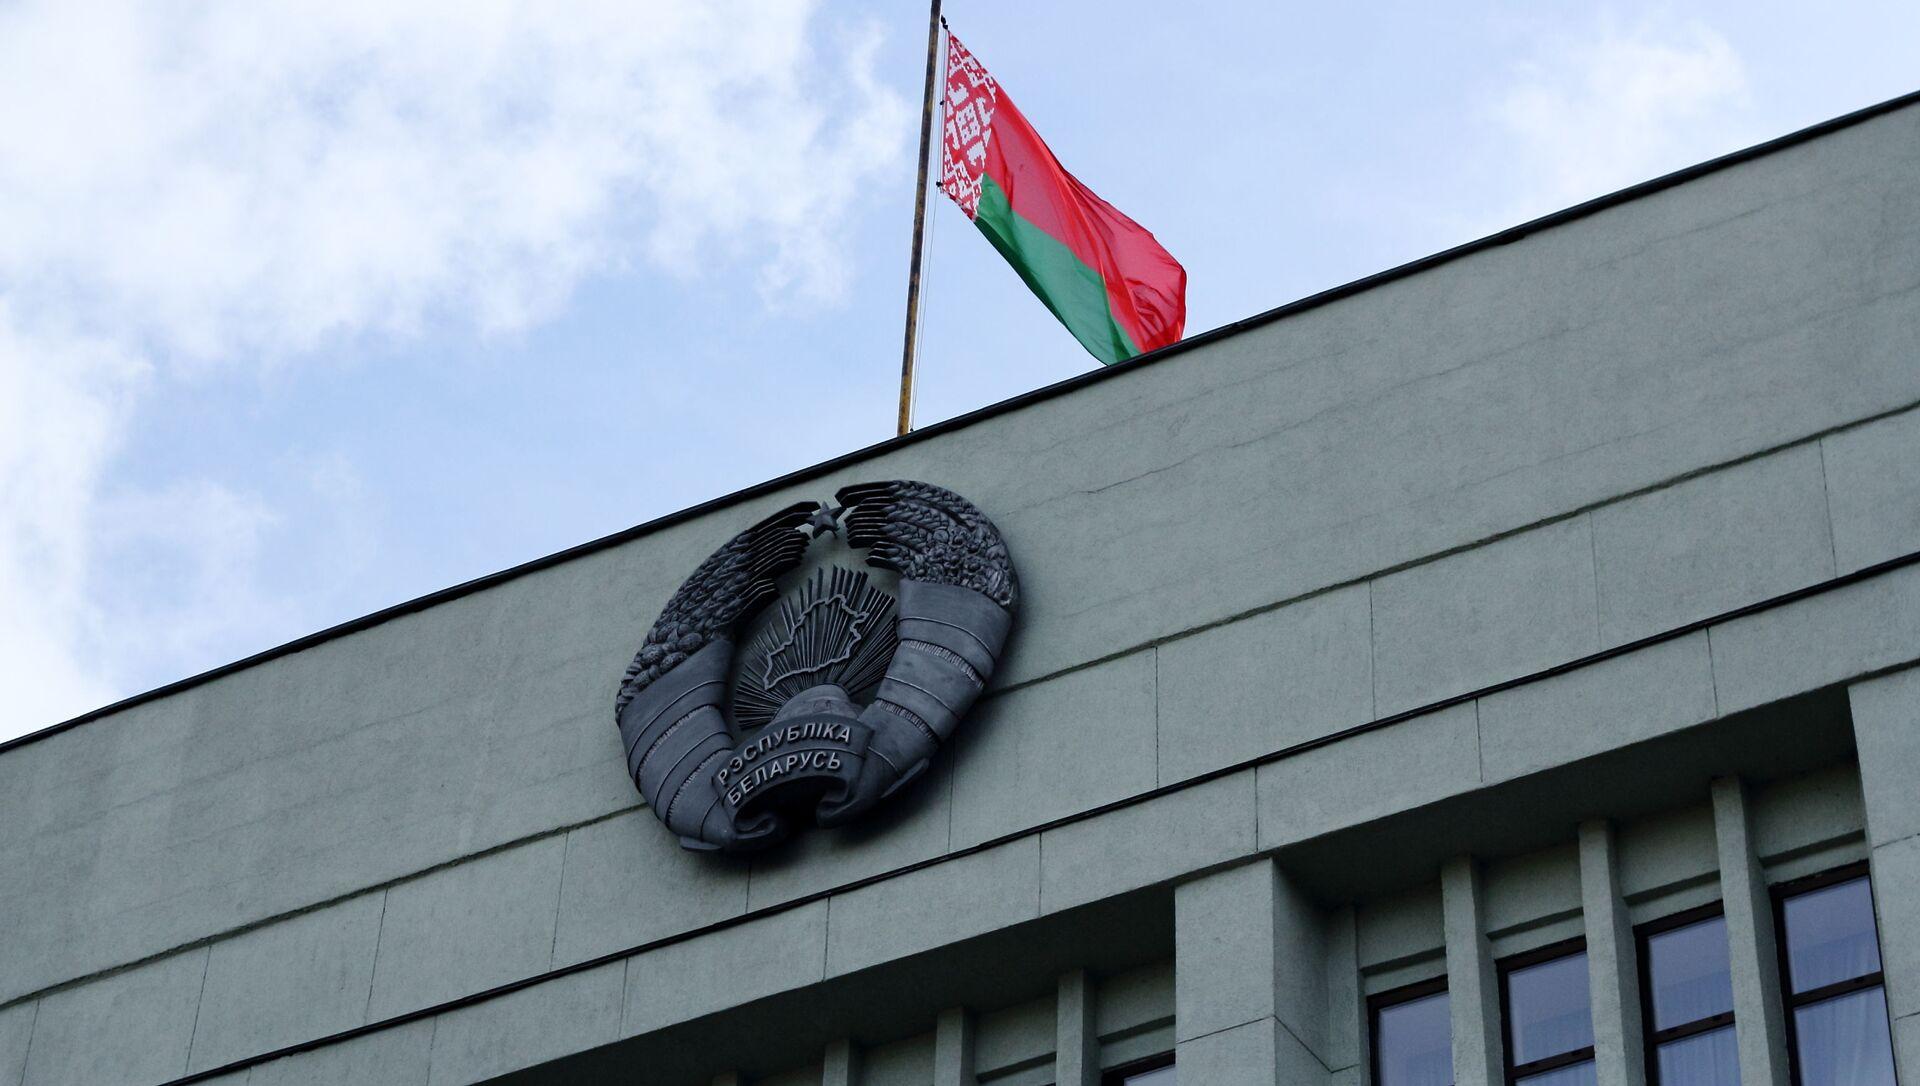 Flaga Białorusi - Sputnik Polska, 1920, 24.03.2021